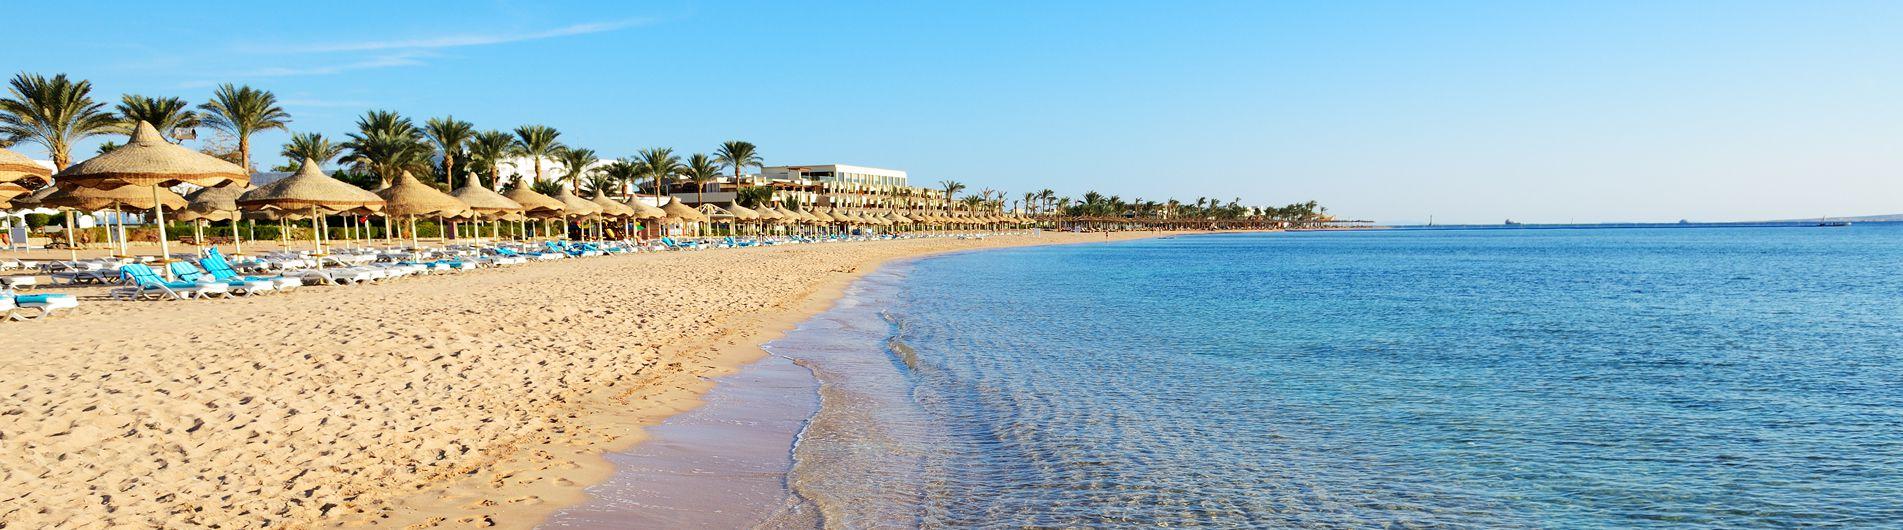 Sharm el Sheikh Holidays